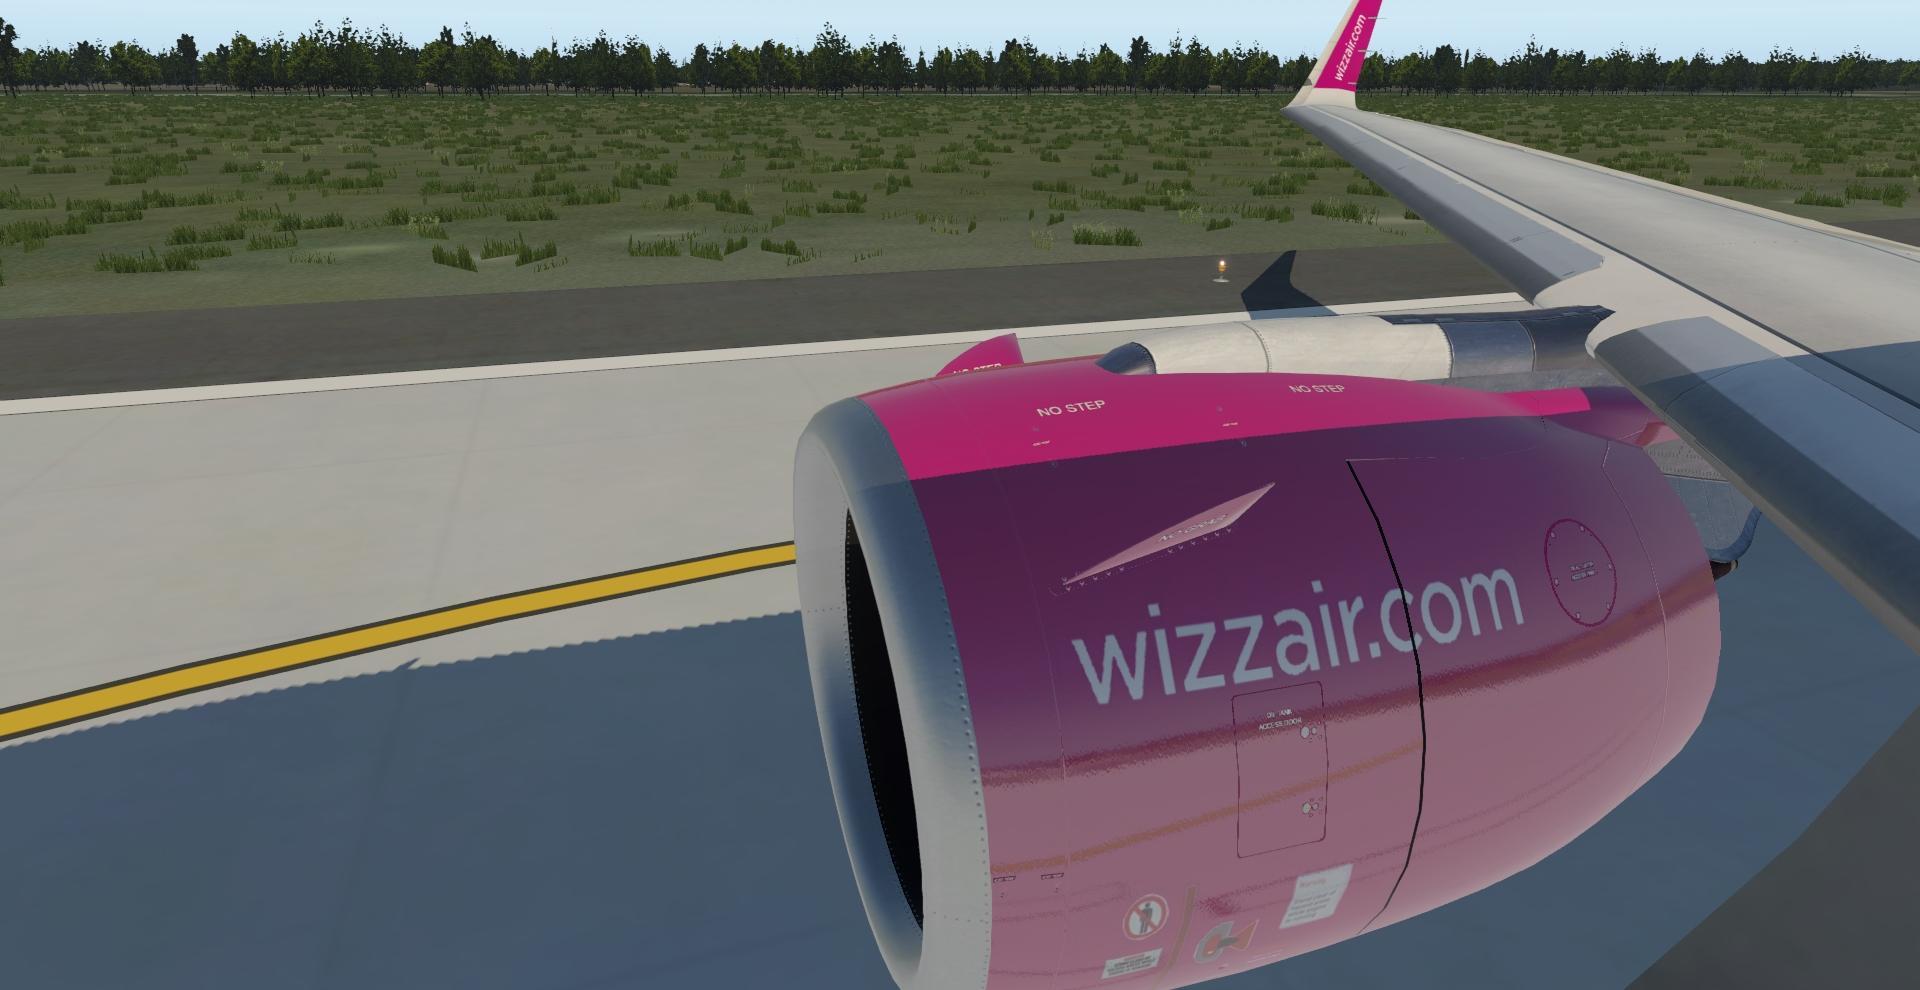 Jar A320 Neo Engine Pw1000g Wizzair Livery Aircraft Skins Liveries X Plane Org Forum